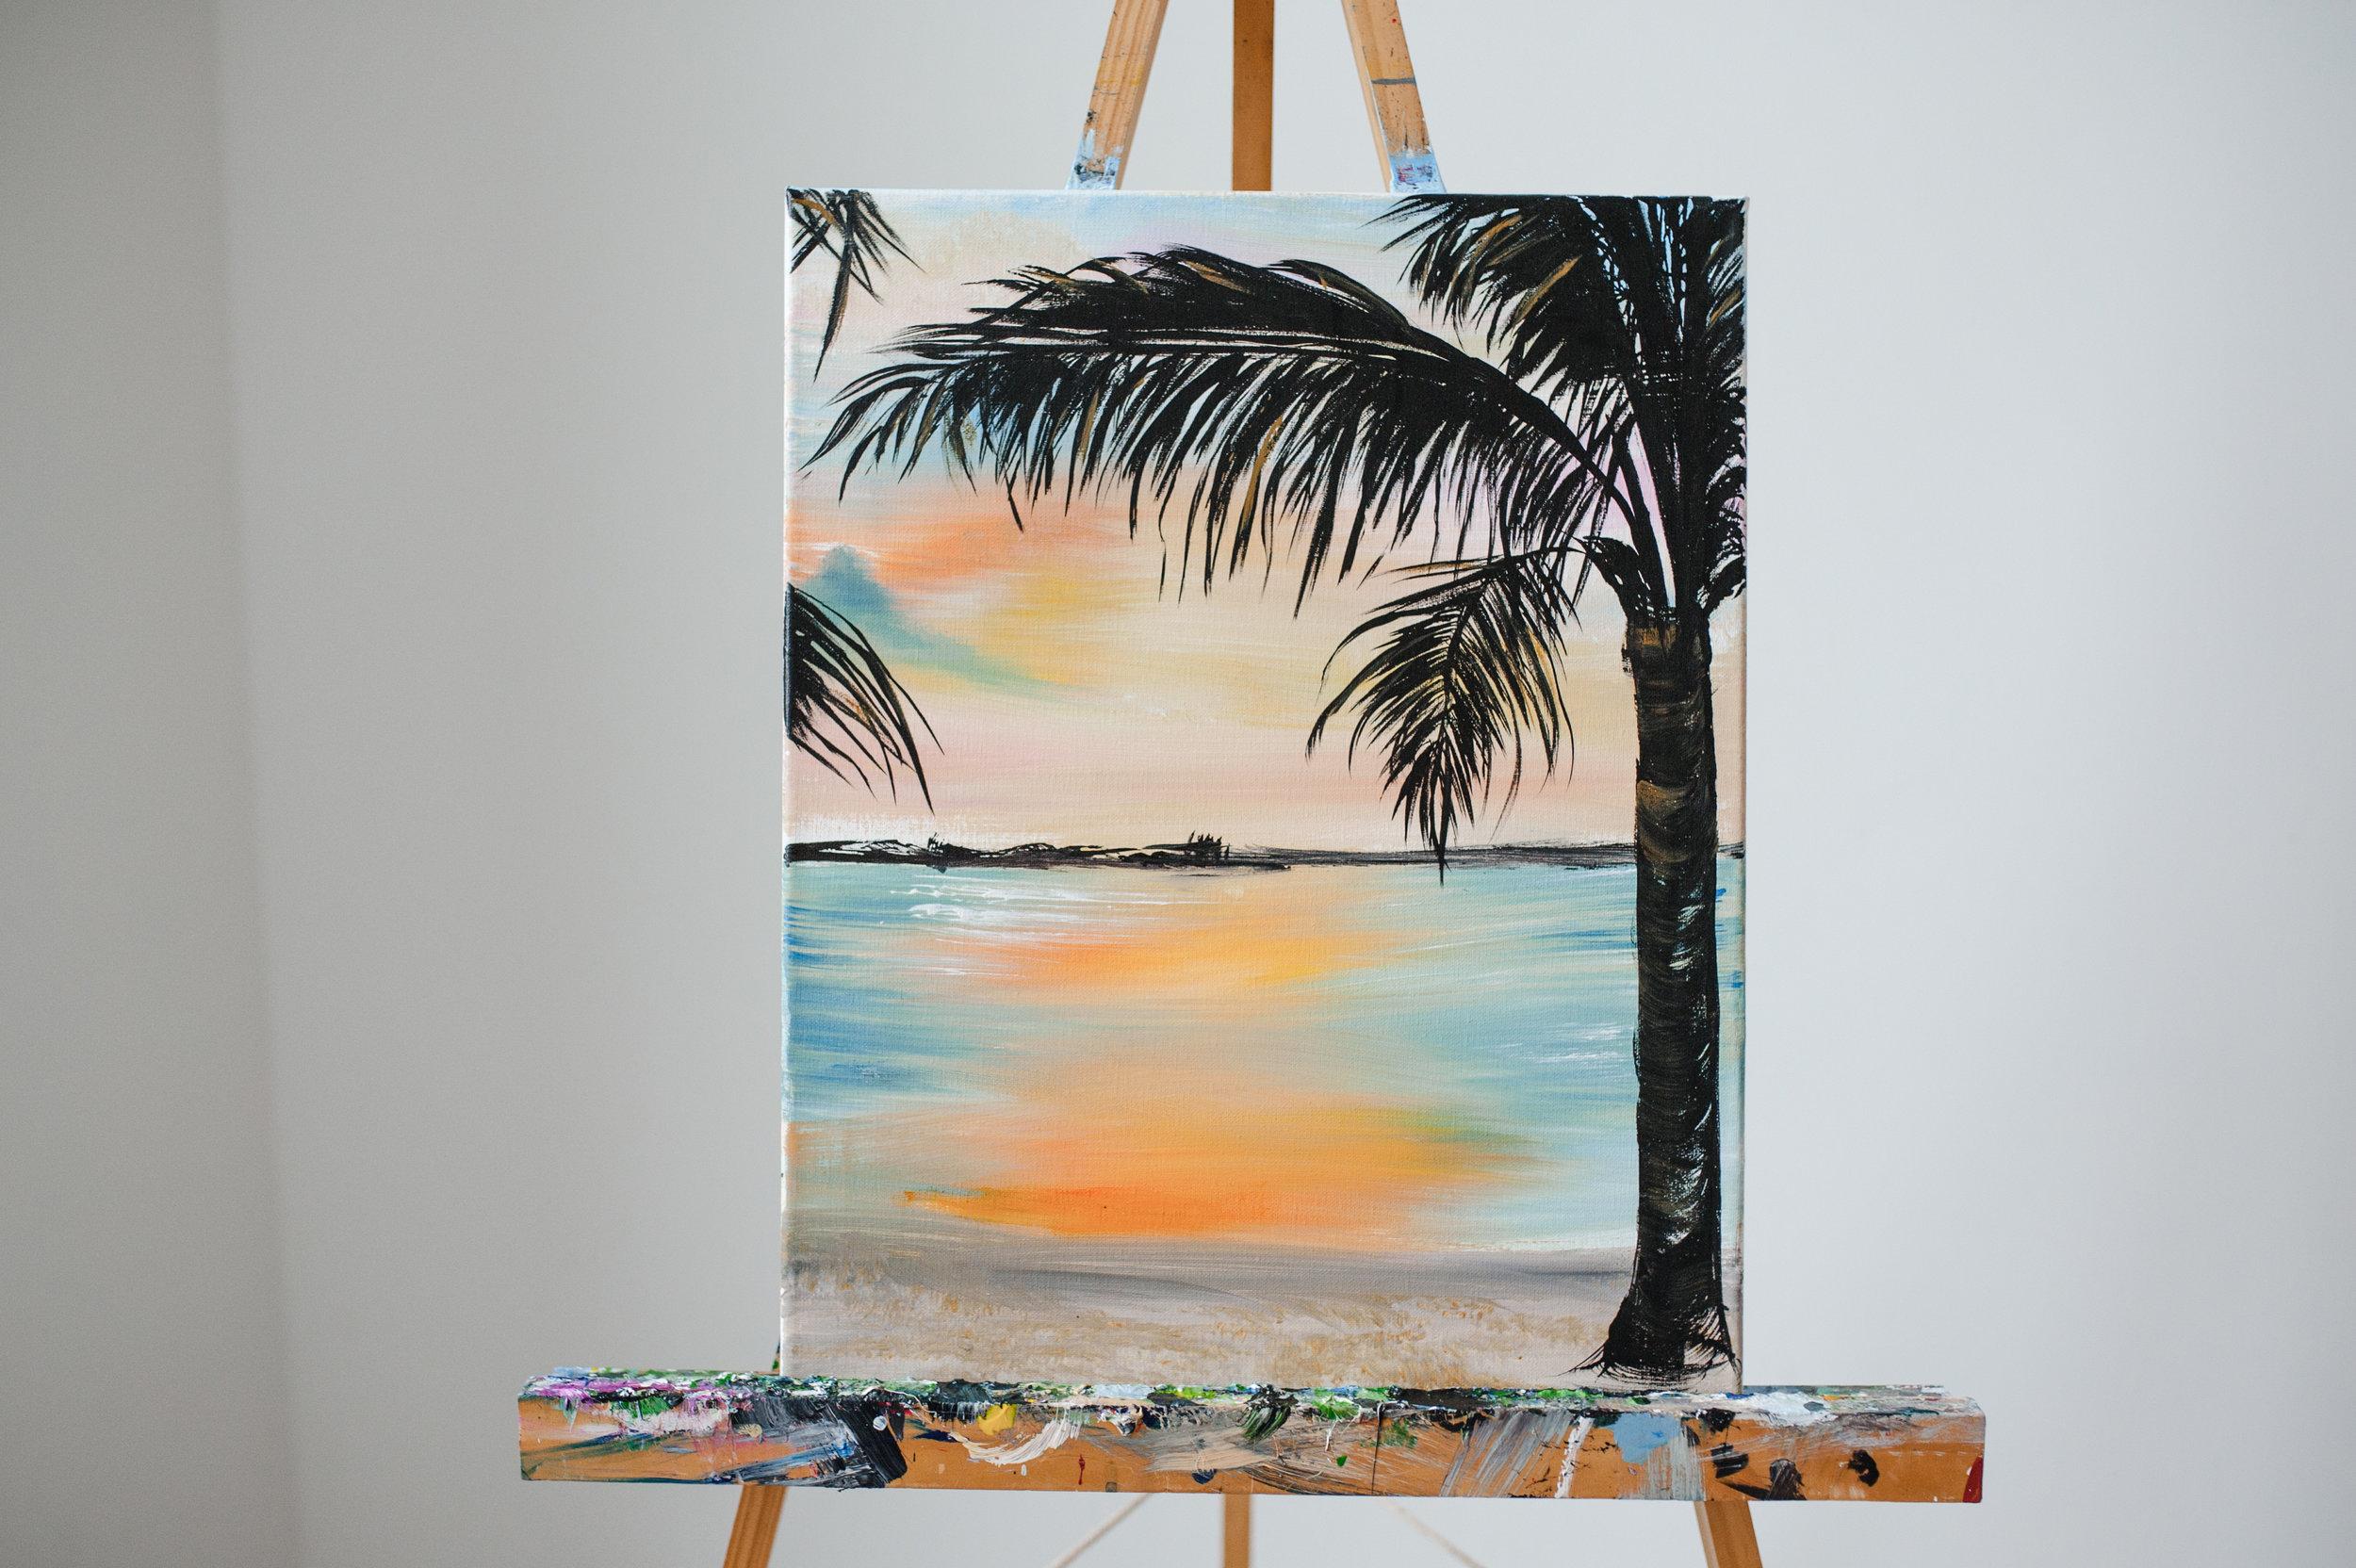 RELAXING BEACH SCENE -